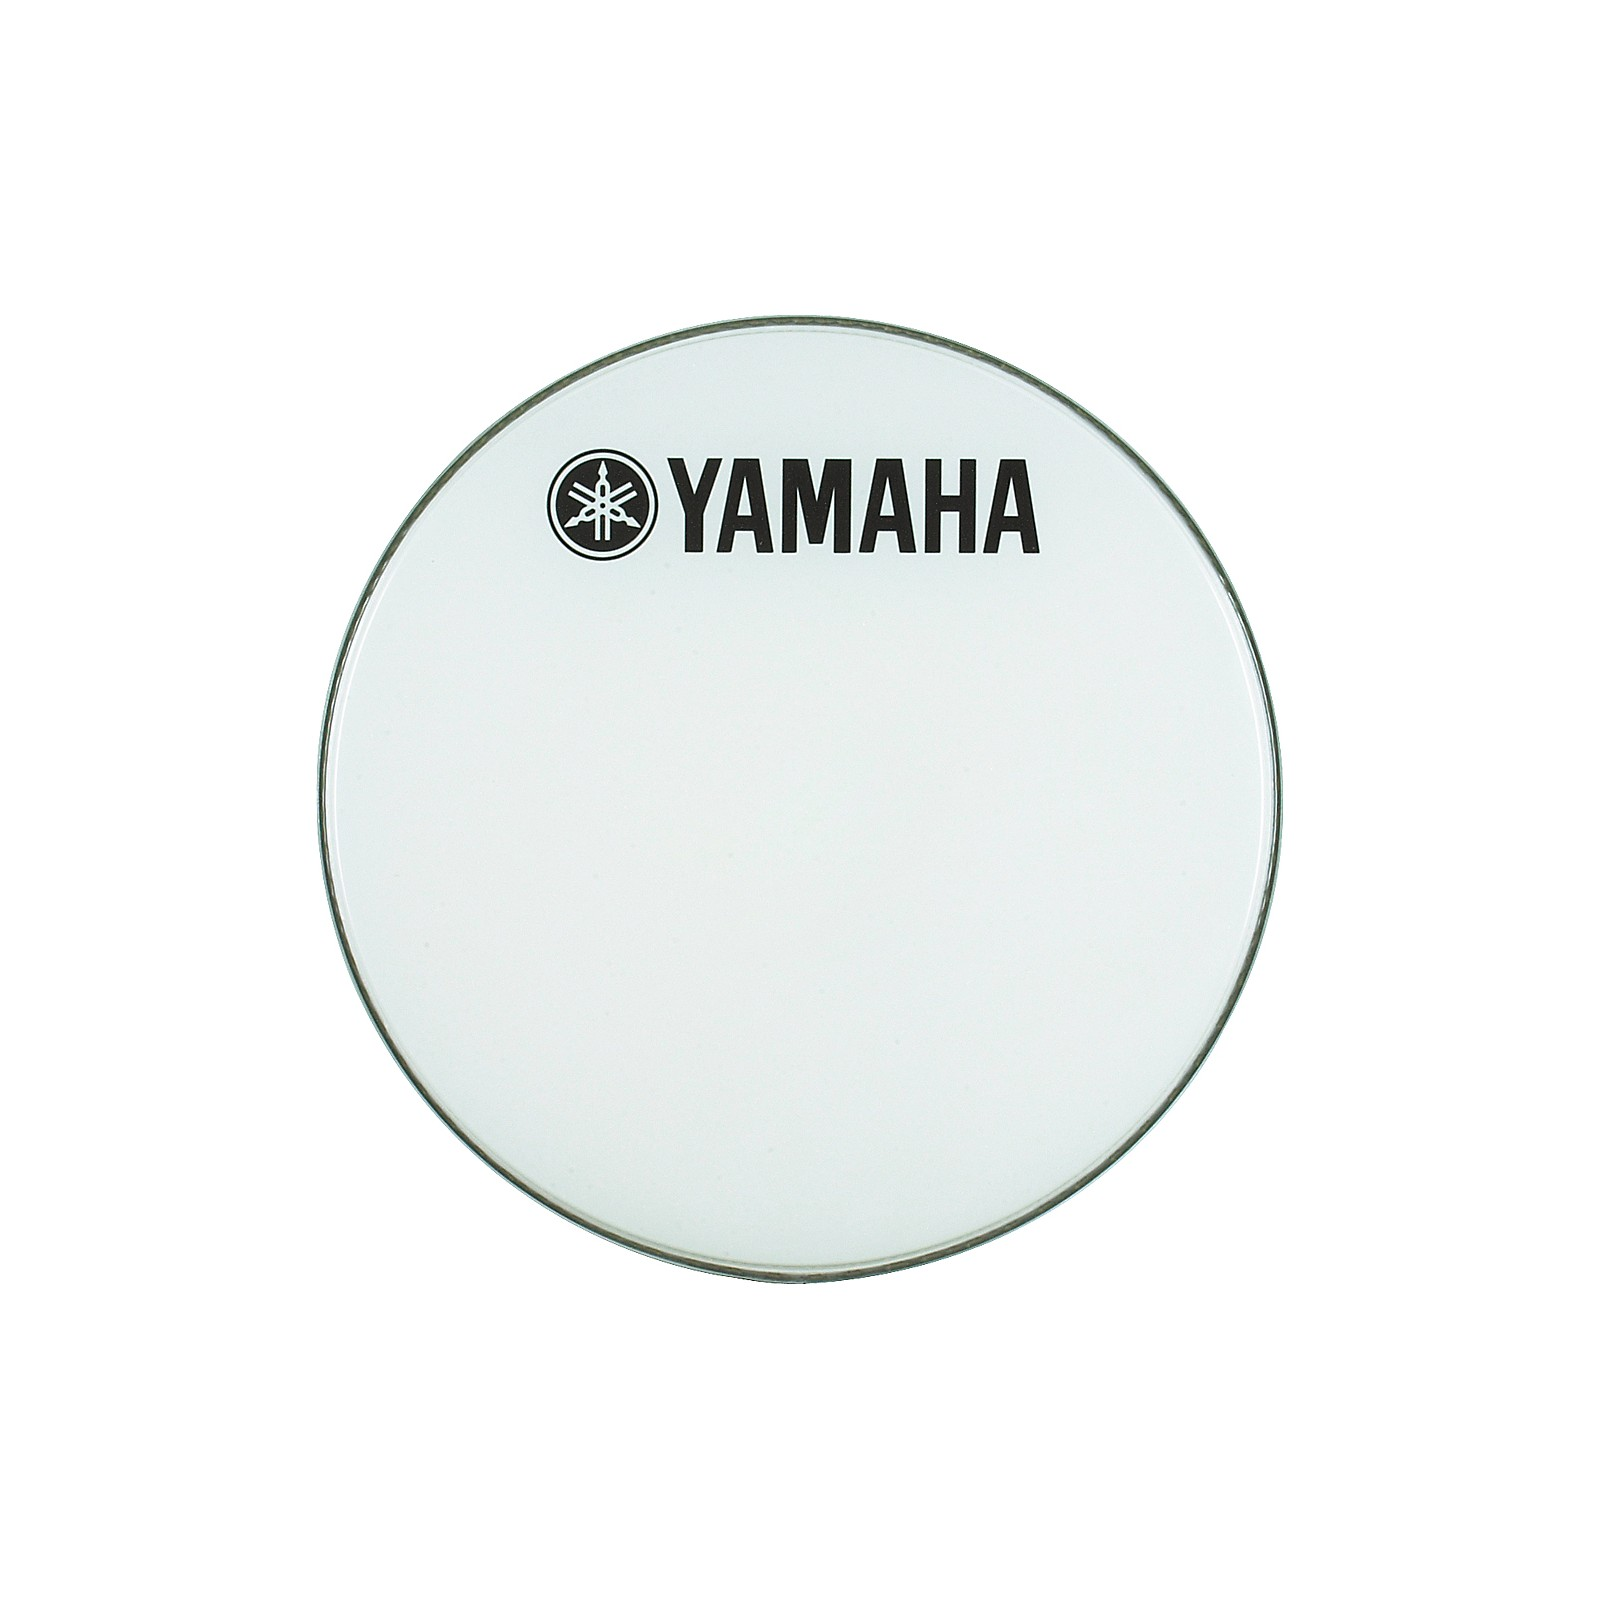 Yamaha Marching Bass Drum Head